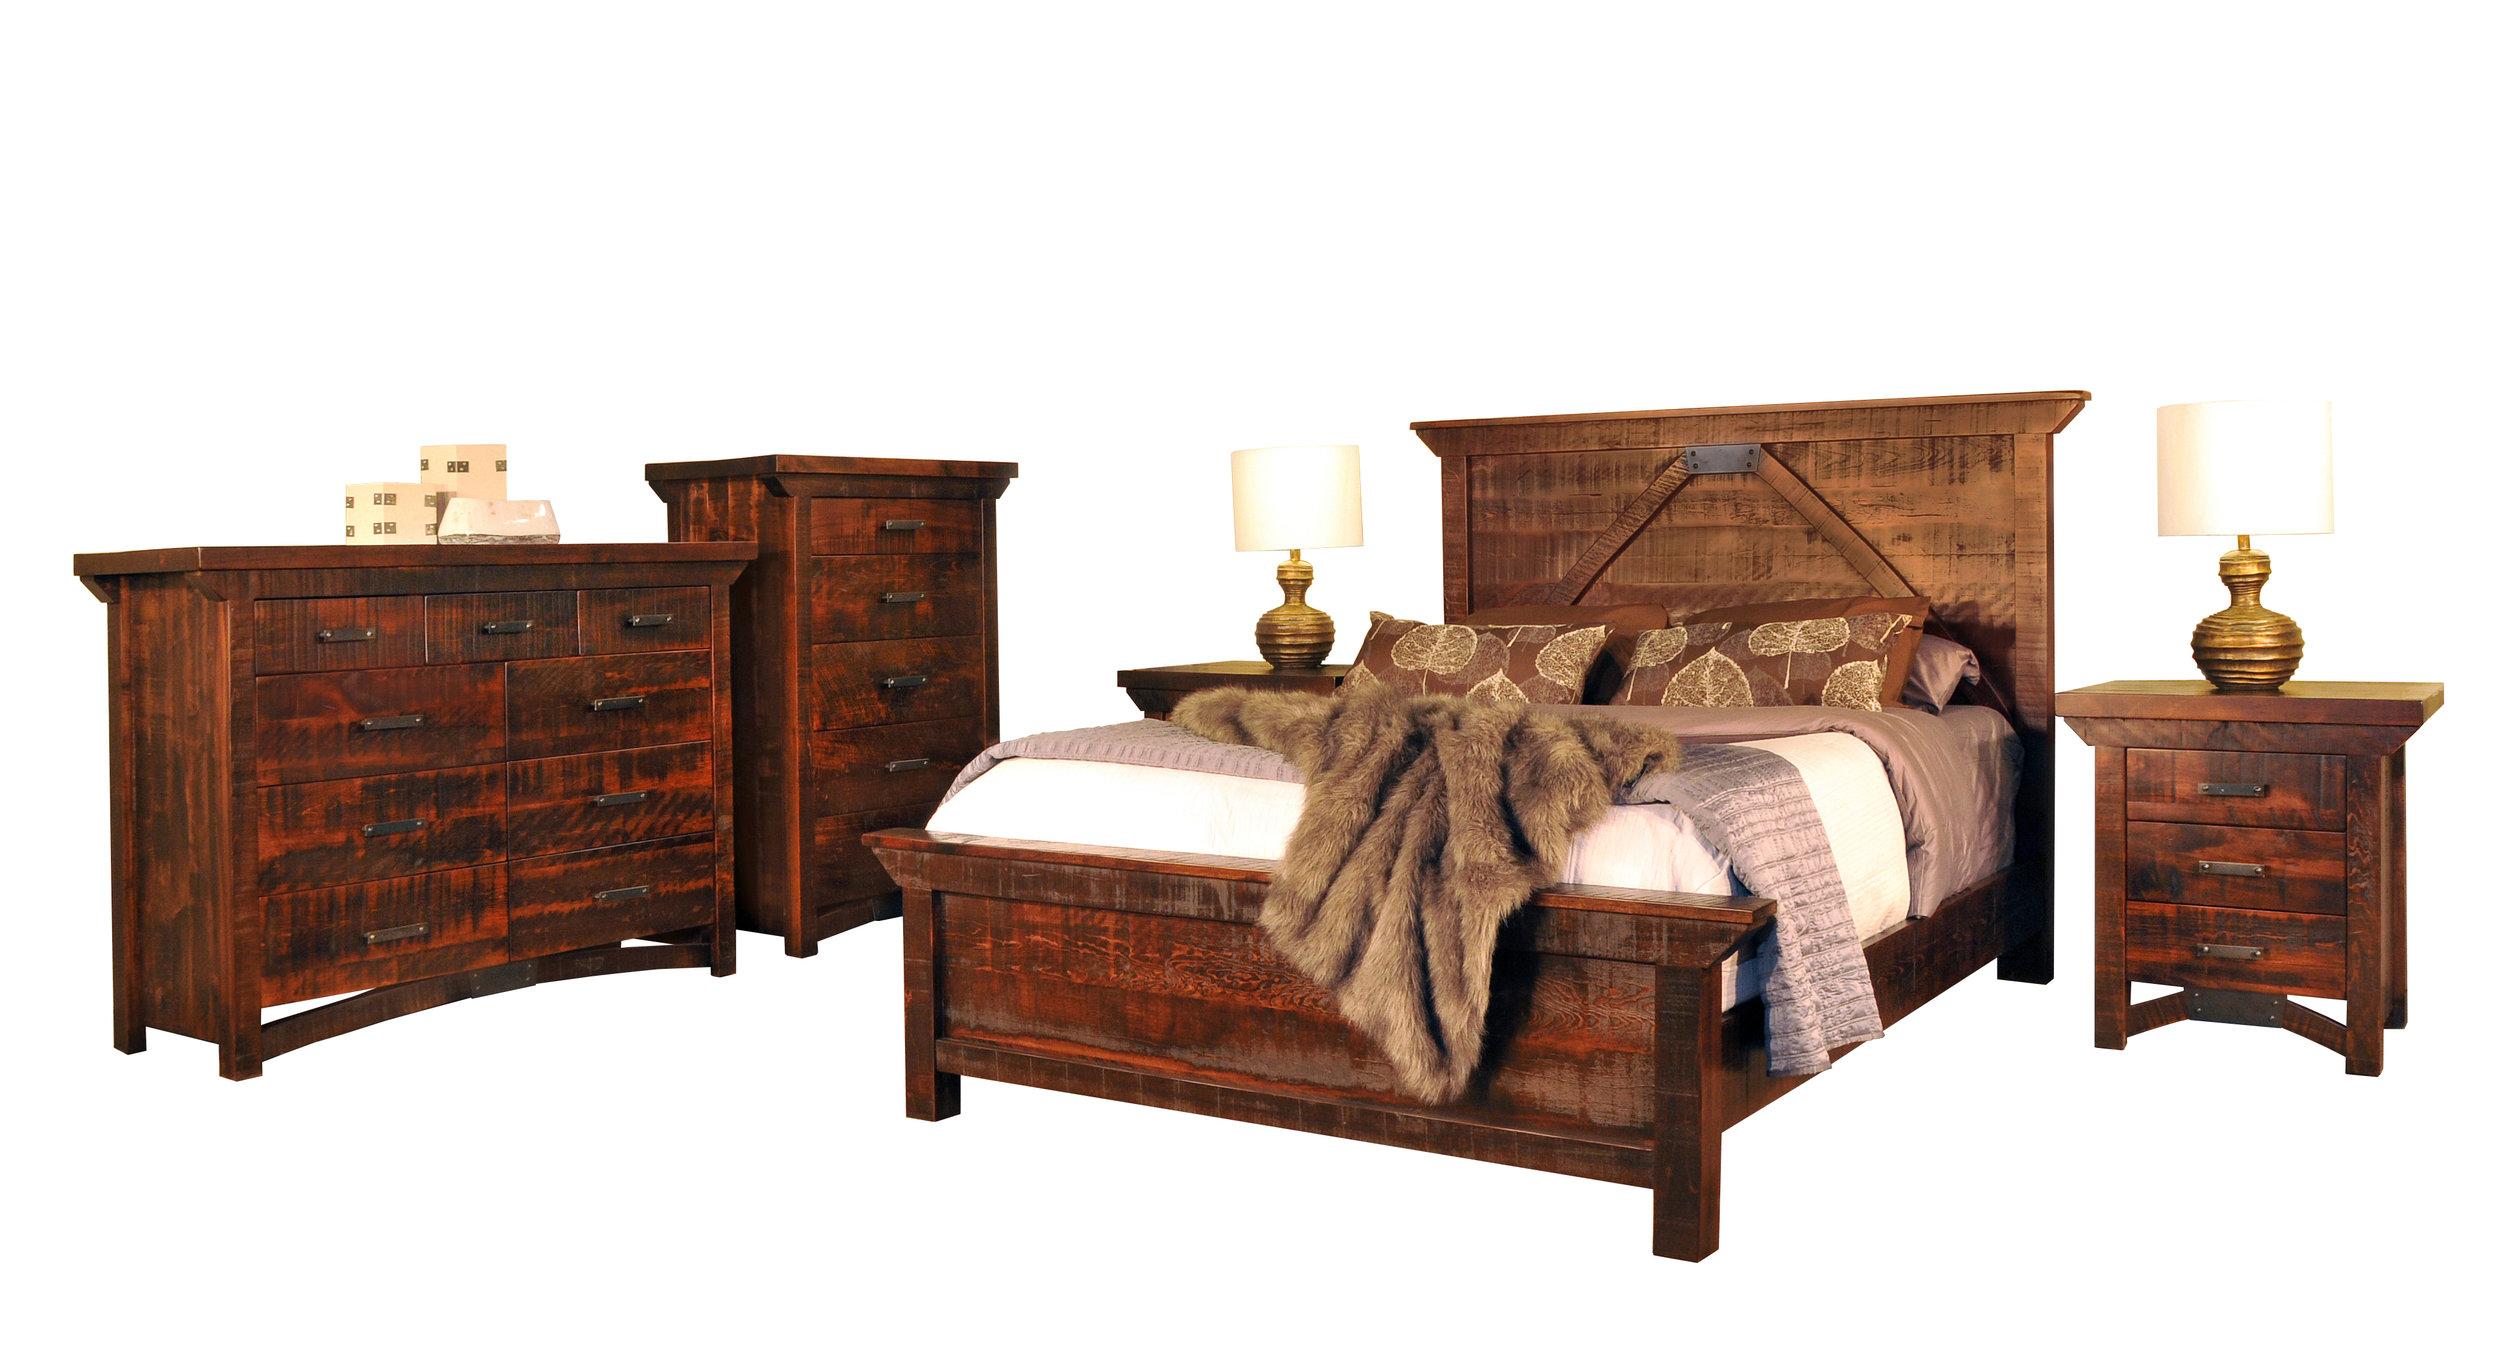 Rustic Carlisle Bedroom set 1 CUT OUT.jpg